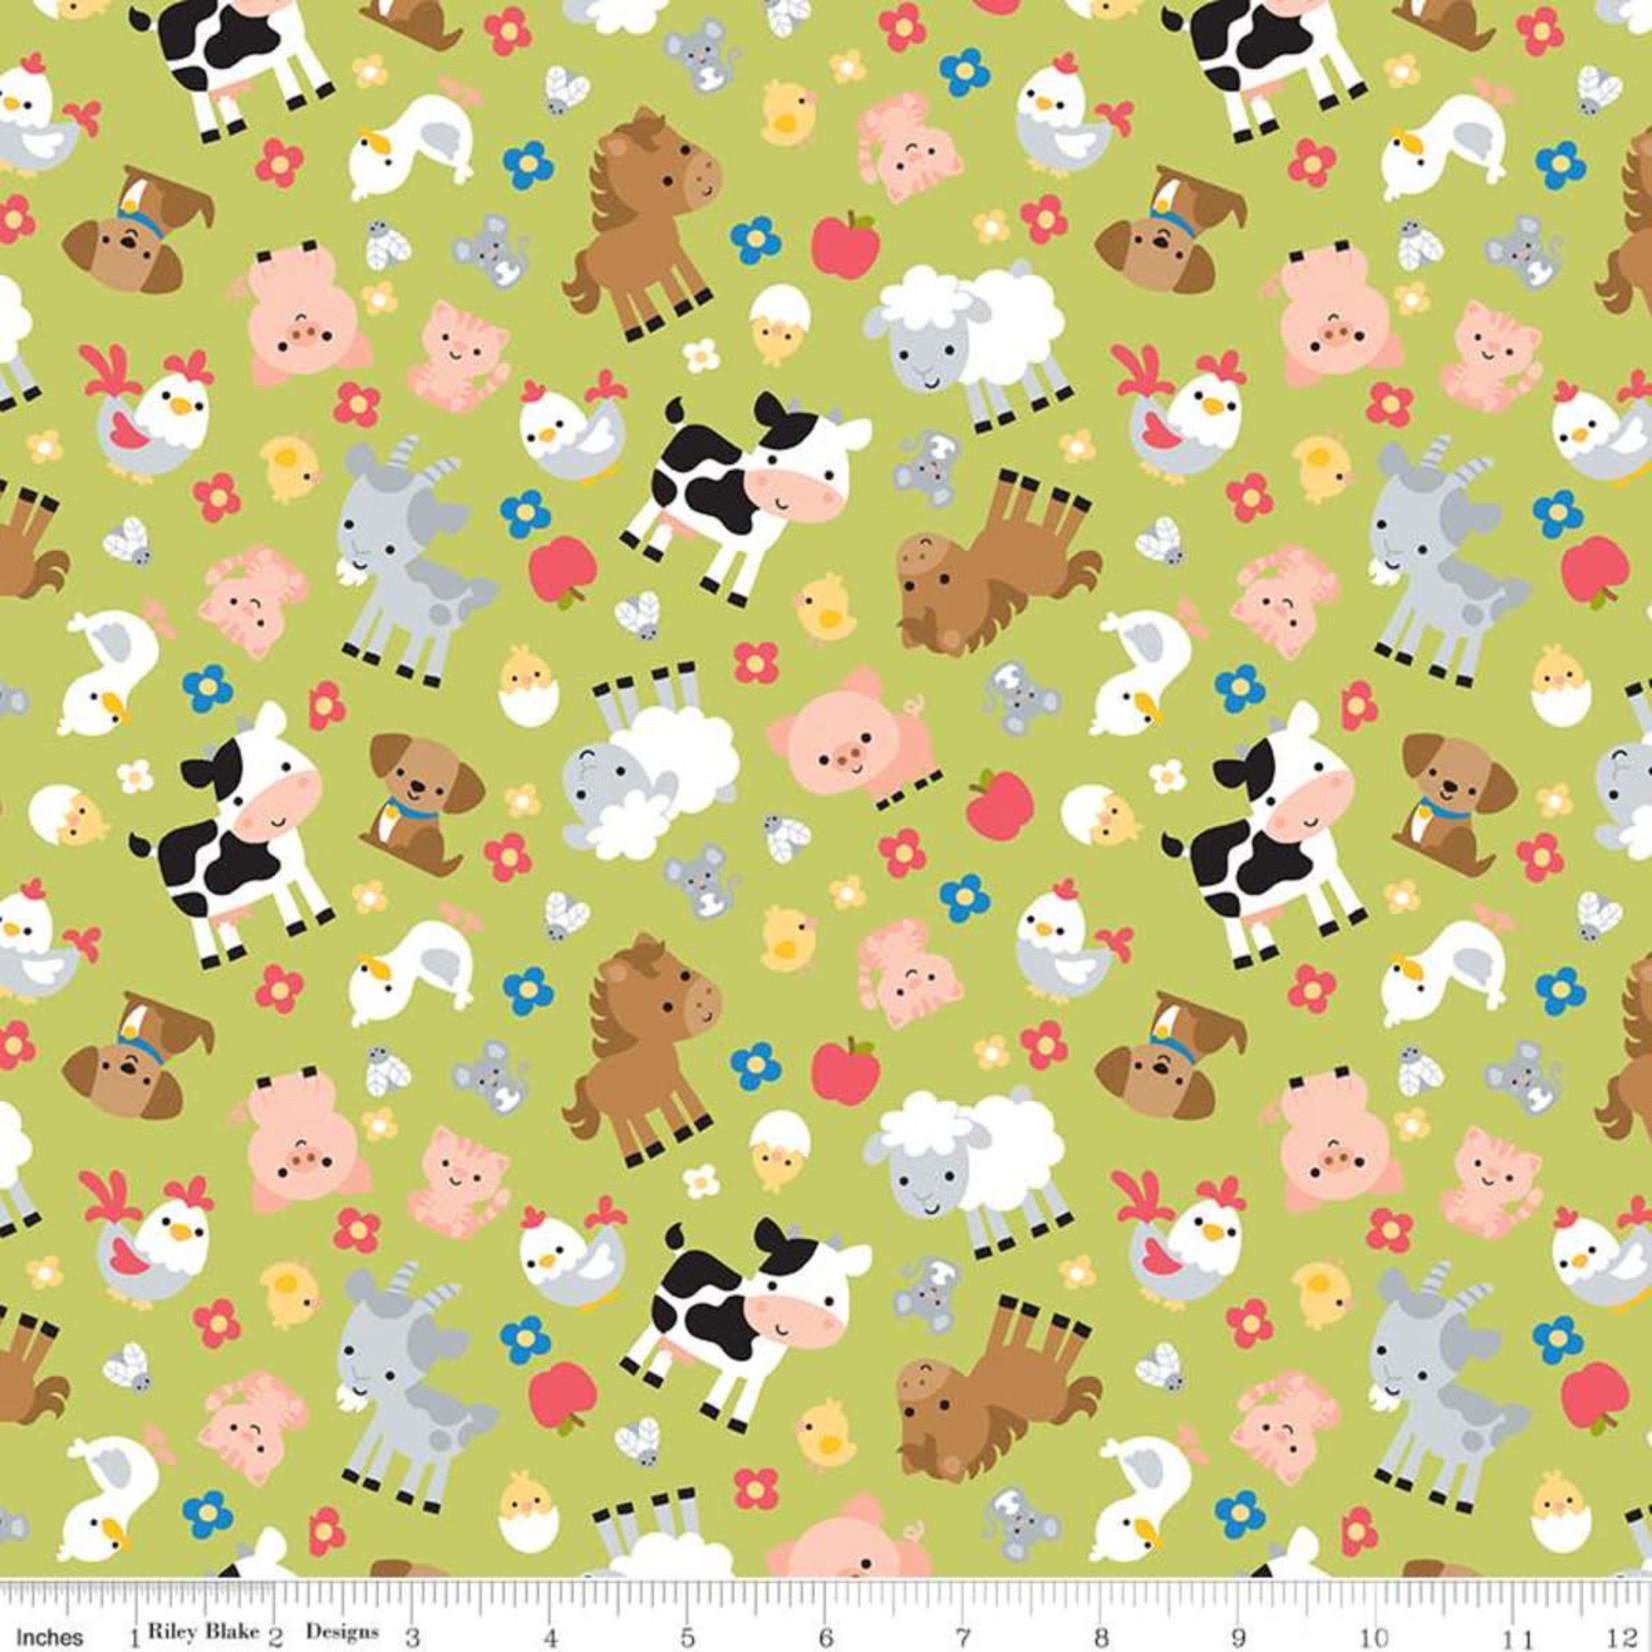 RILEY BLAKE DESIGNS DOWN ON THE FARM, ANIMALS, GREEN PER CM OR $20/M